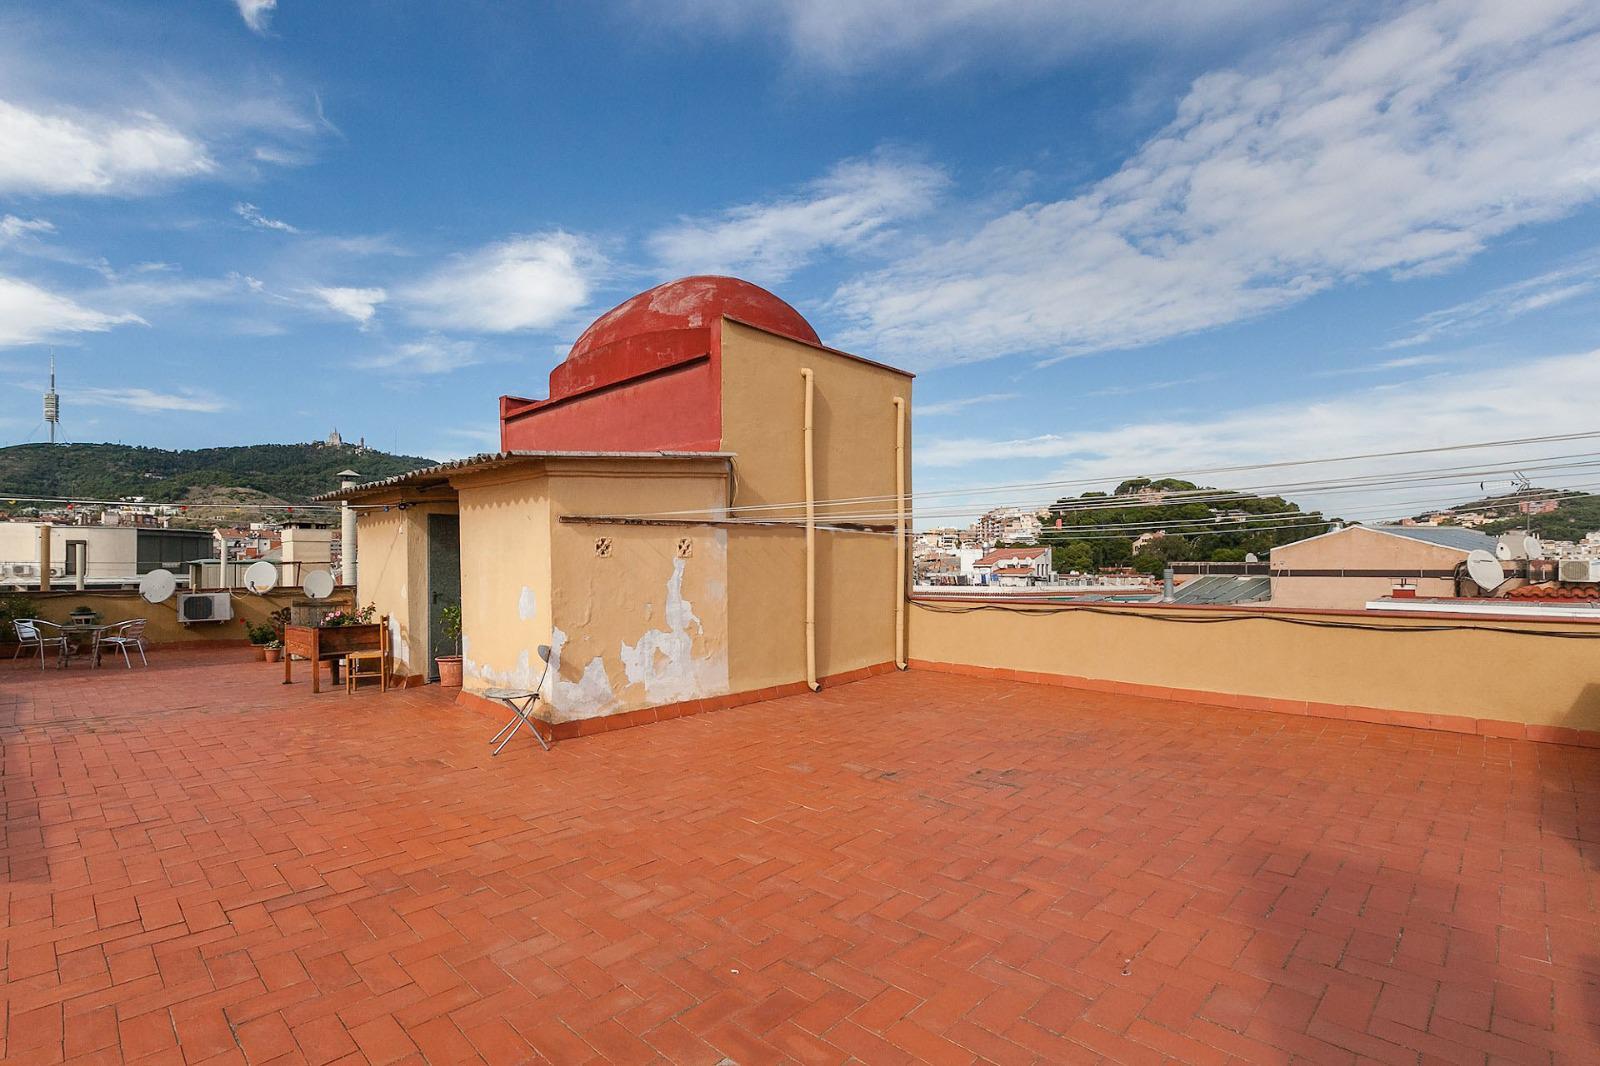 247916 Flat for sale in Sarrià-Sant Gervasi, Sant Gervasi-Galvany 33